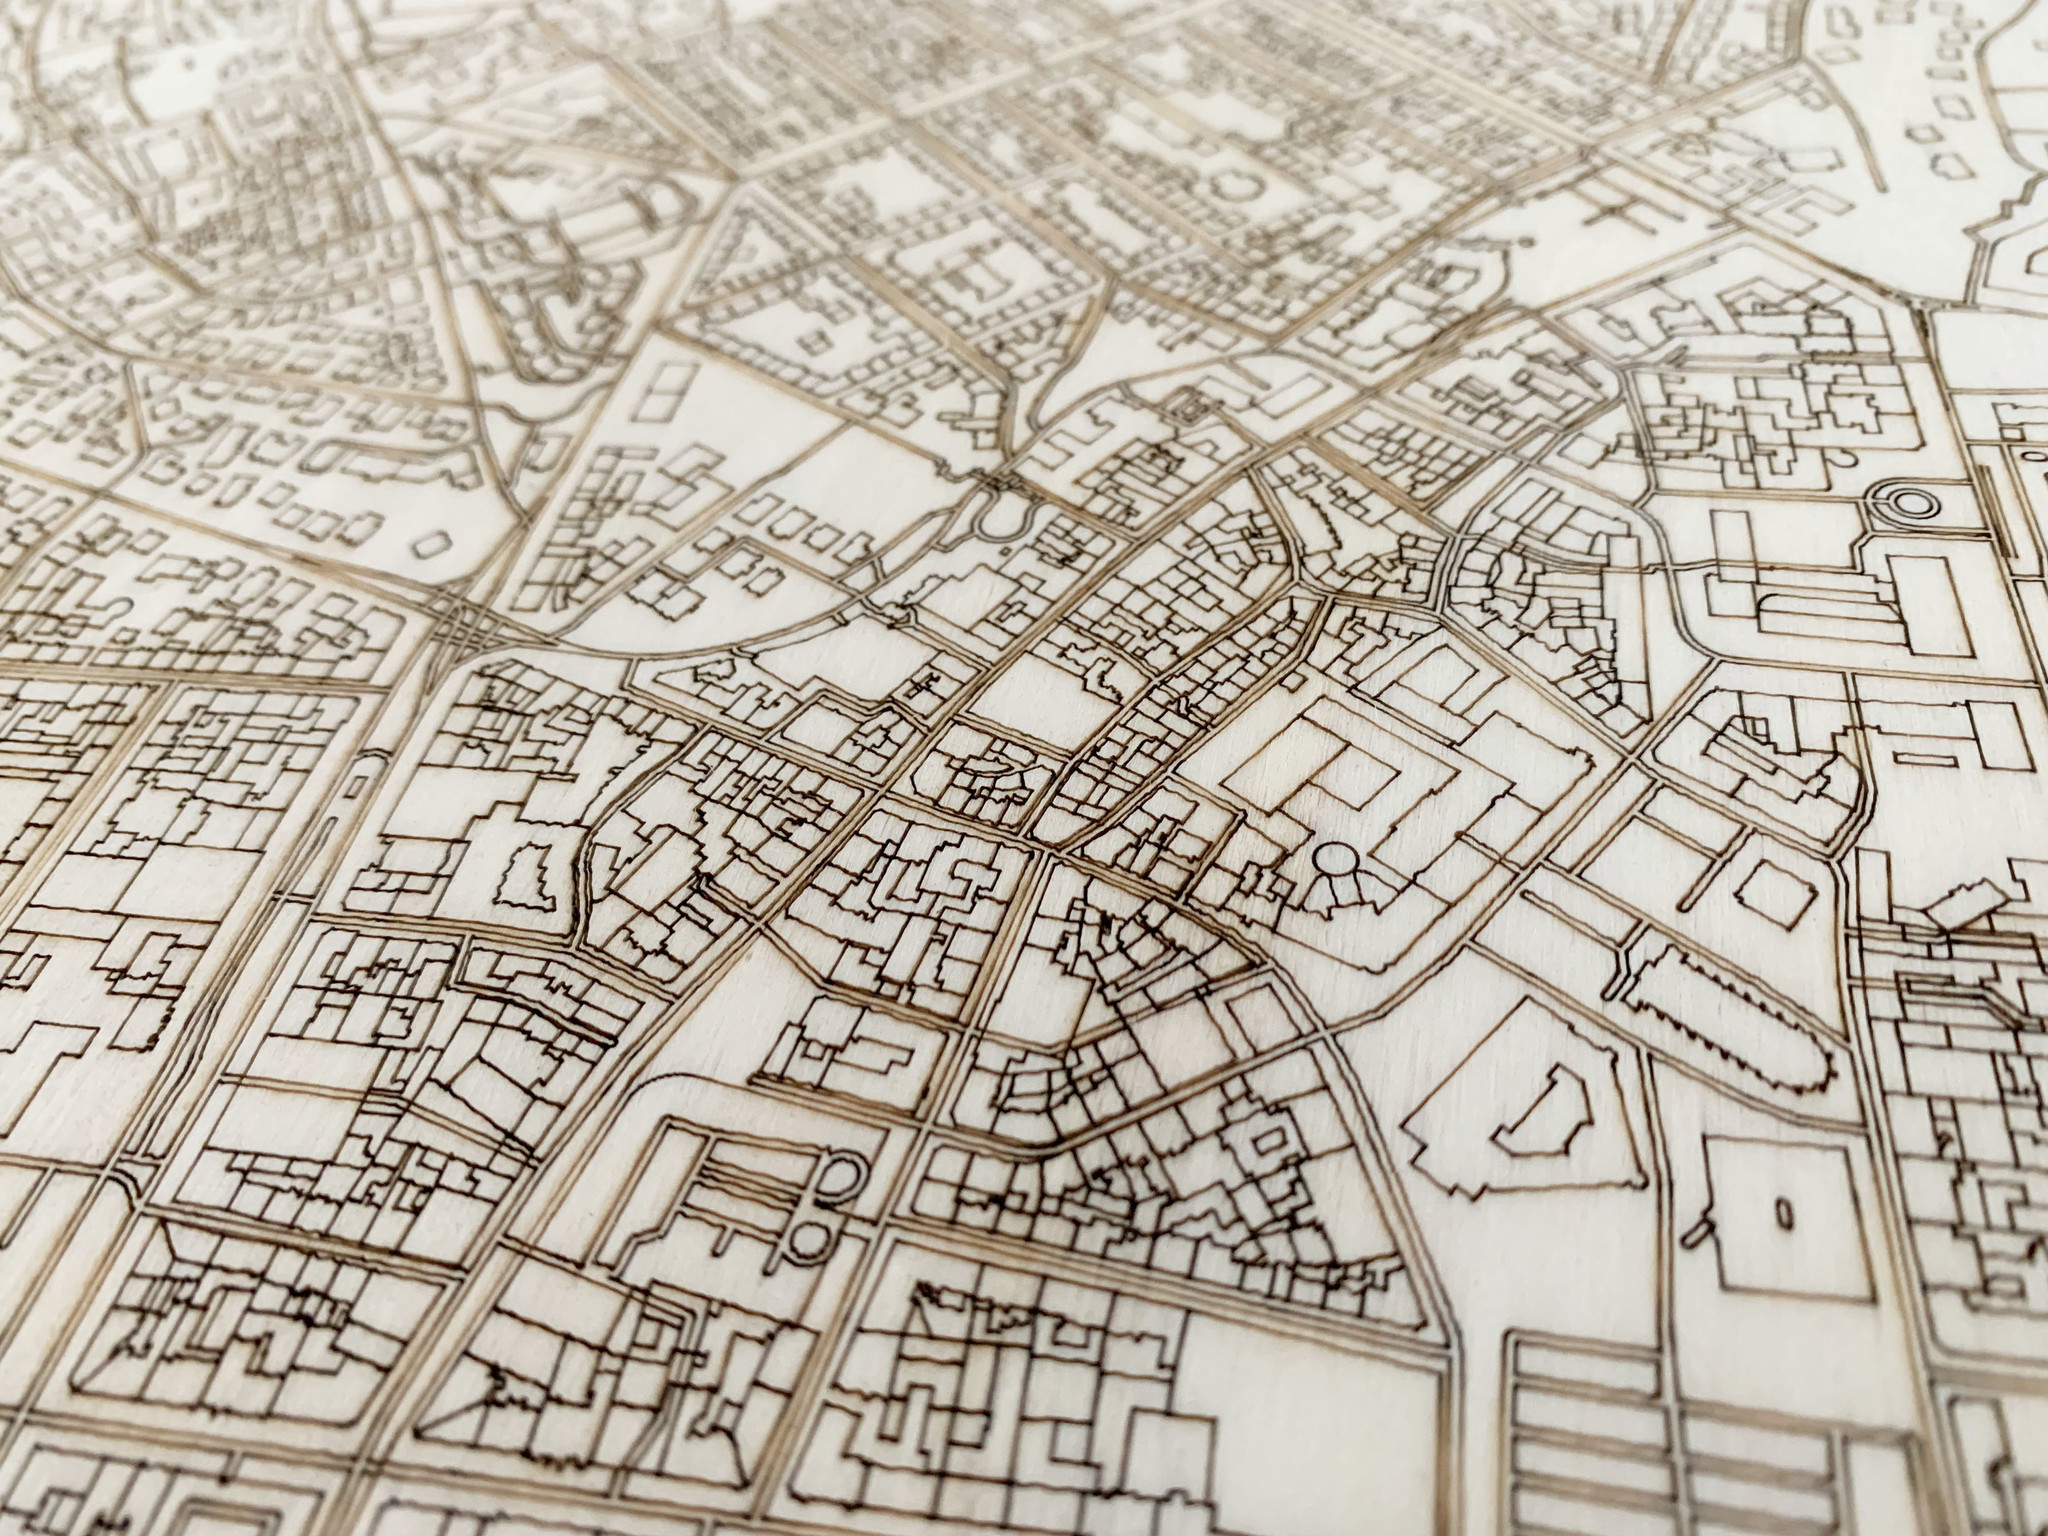 Stadtkarte Wiesbaden | Wanddekoration Holz-4